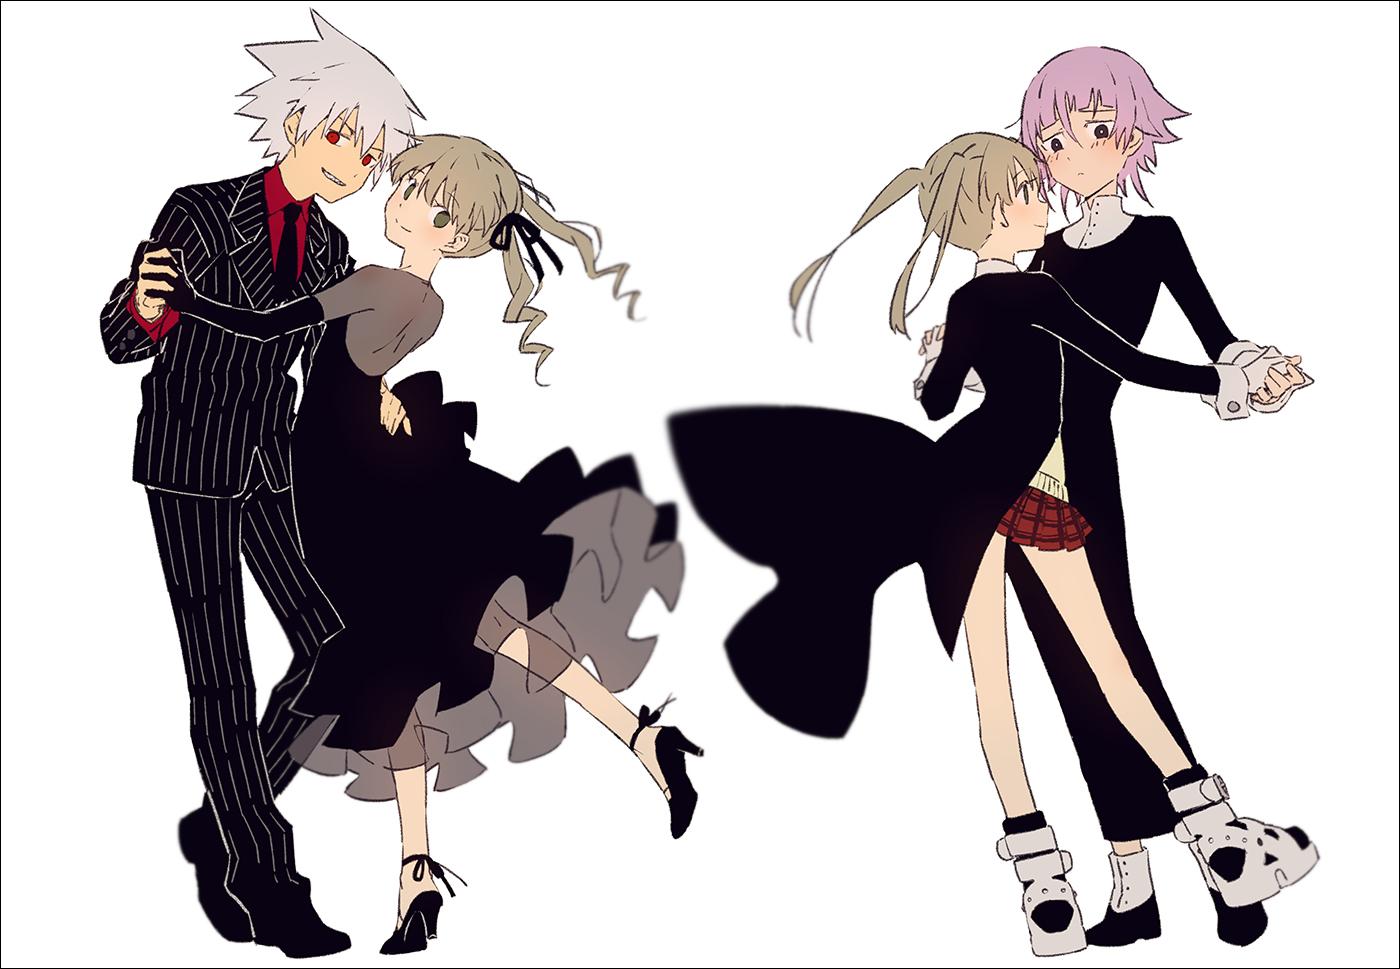 Soul Eater Ohkubo Atsushi Image 2257851 Zerochan Anime